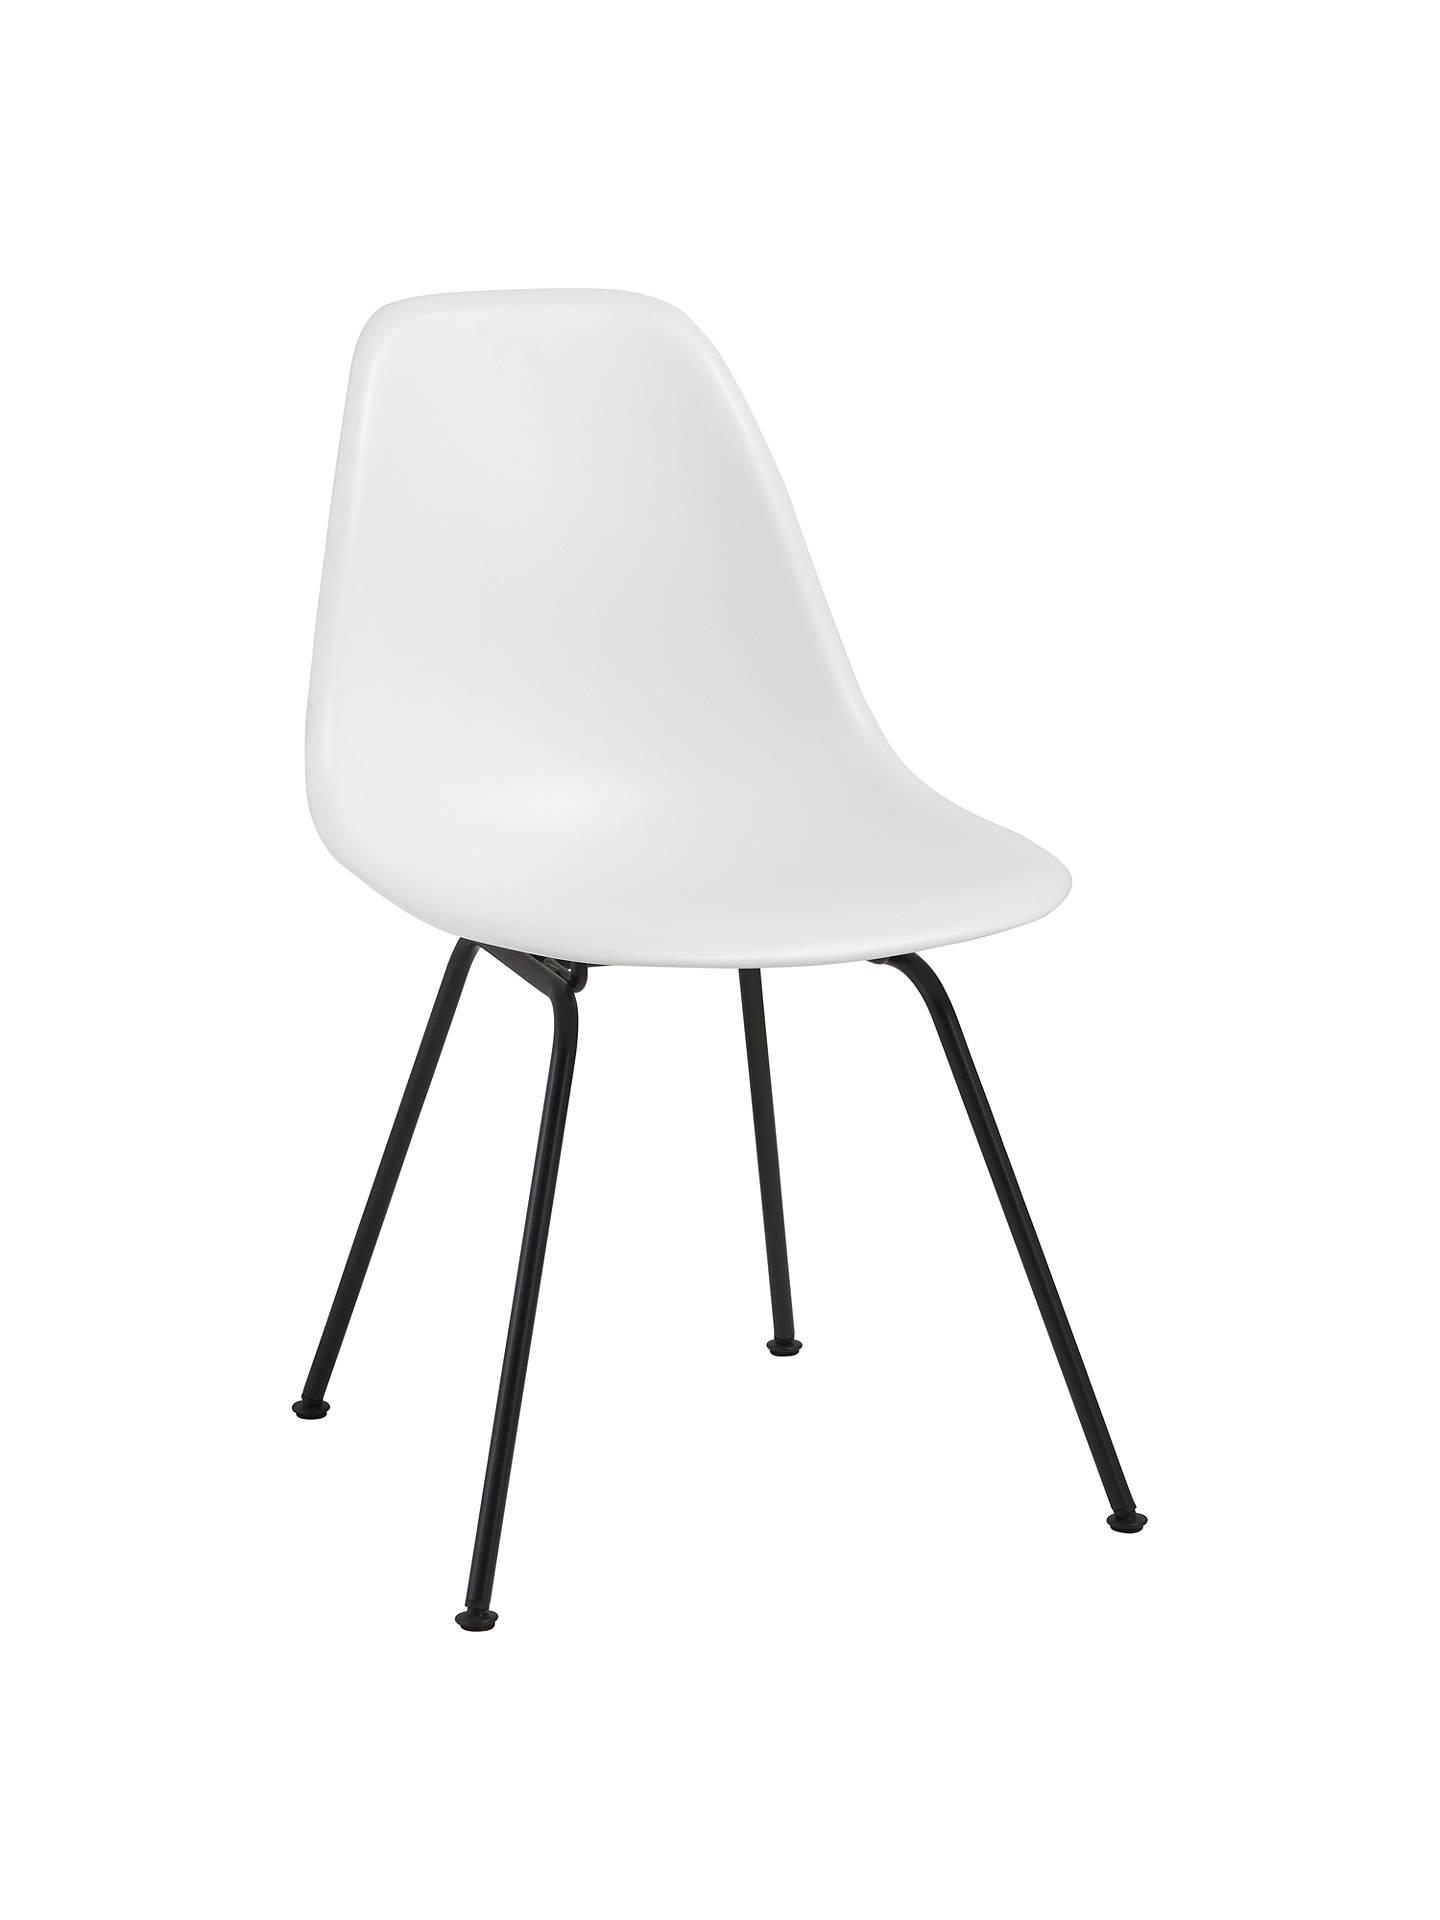 Vitra Eames Dsx Side Chair Black Metal Leg At John Lewis Partners